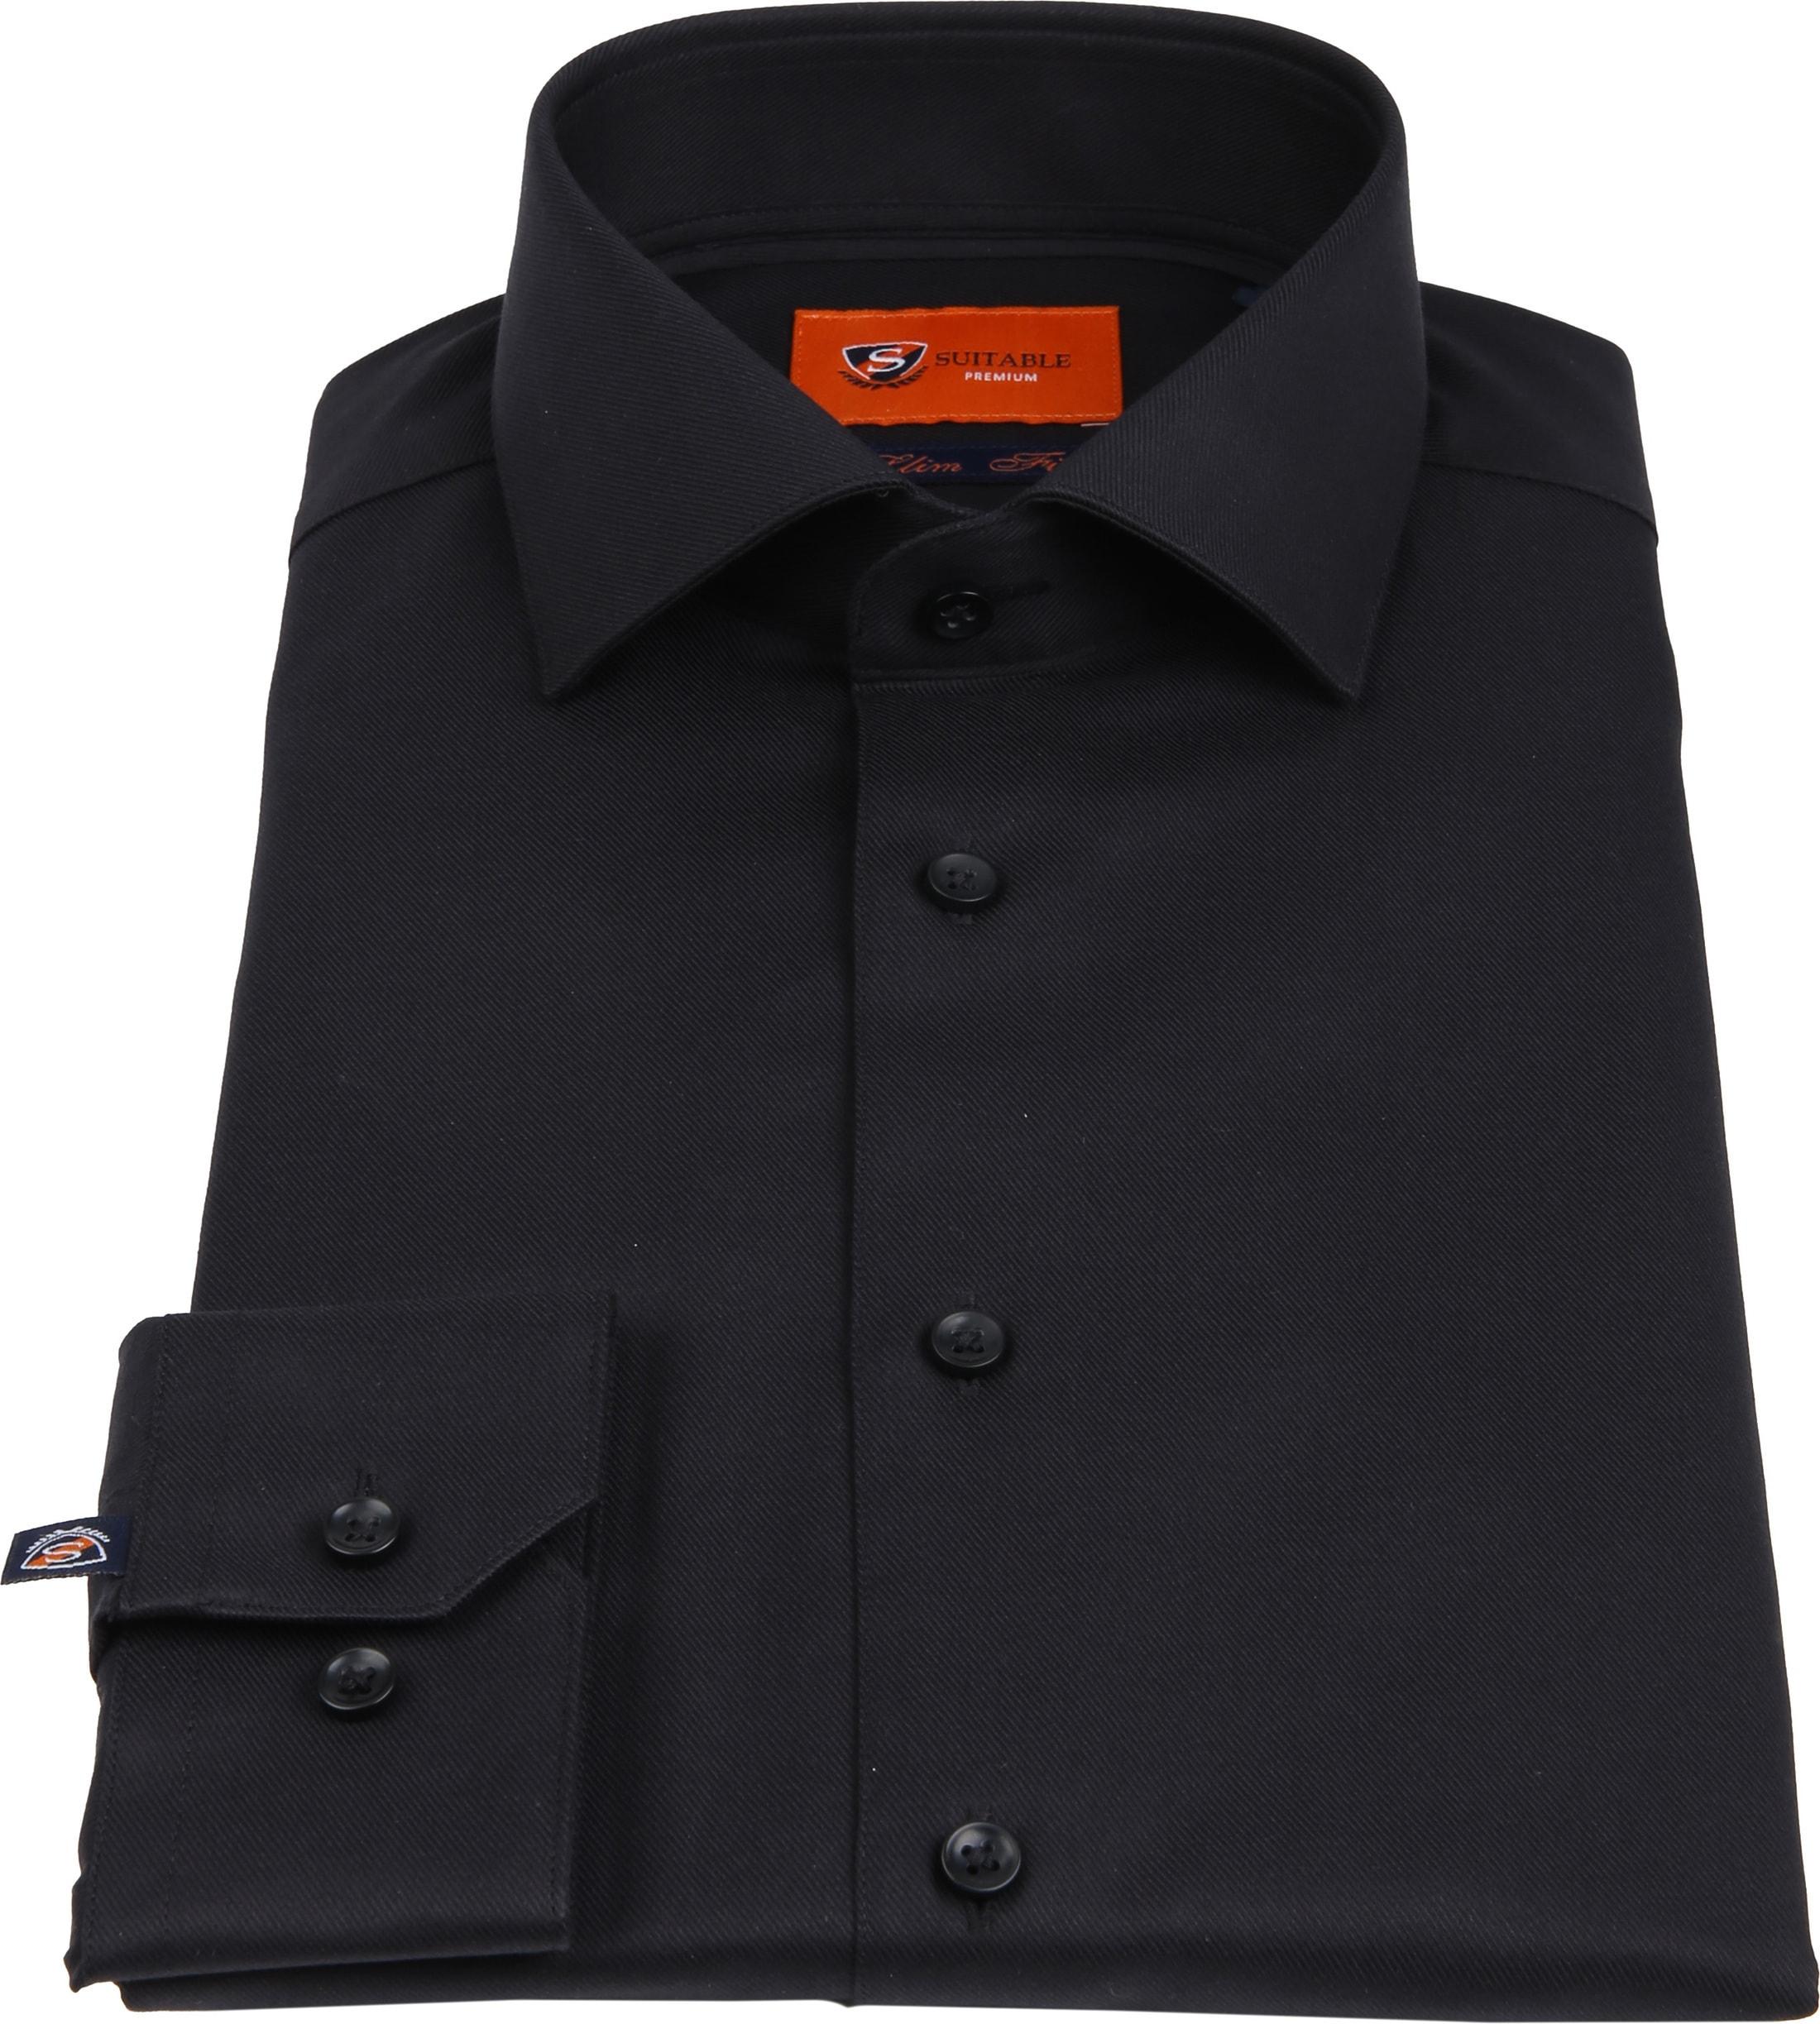 Suitable Shirt Black Pepita foto 3